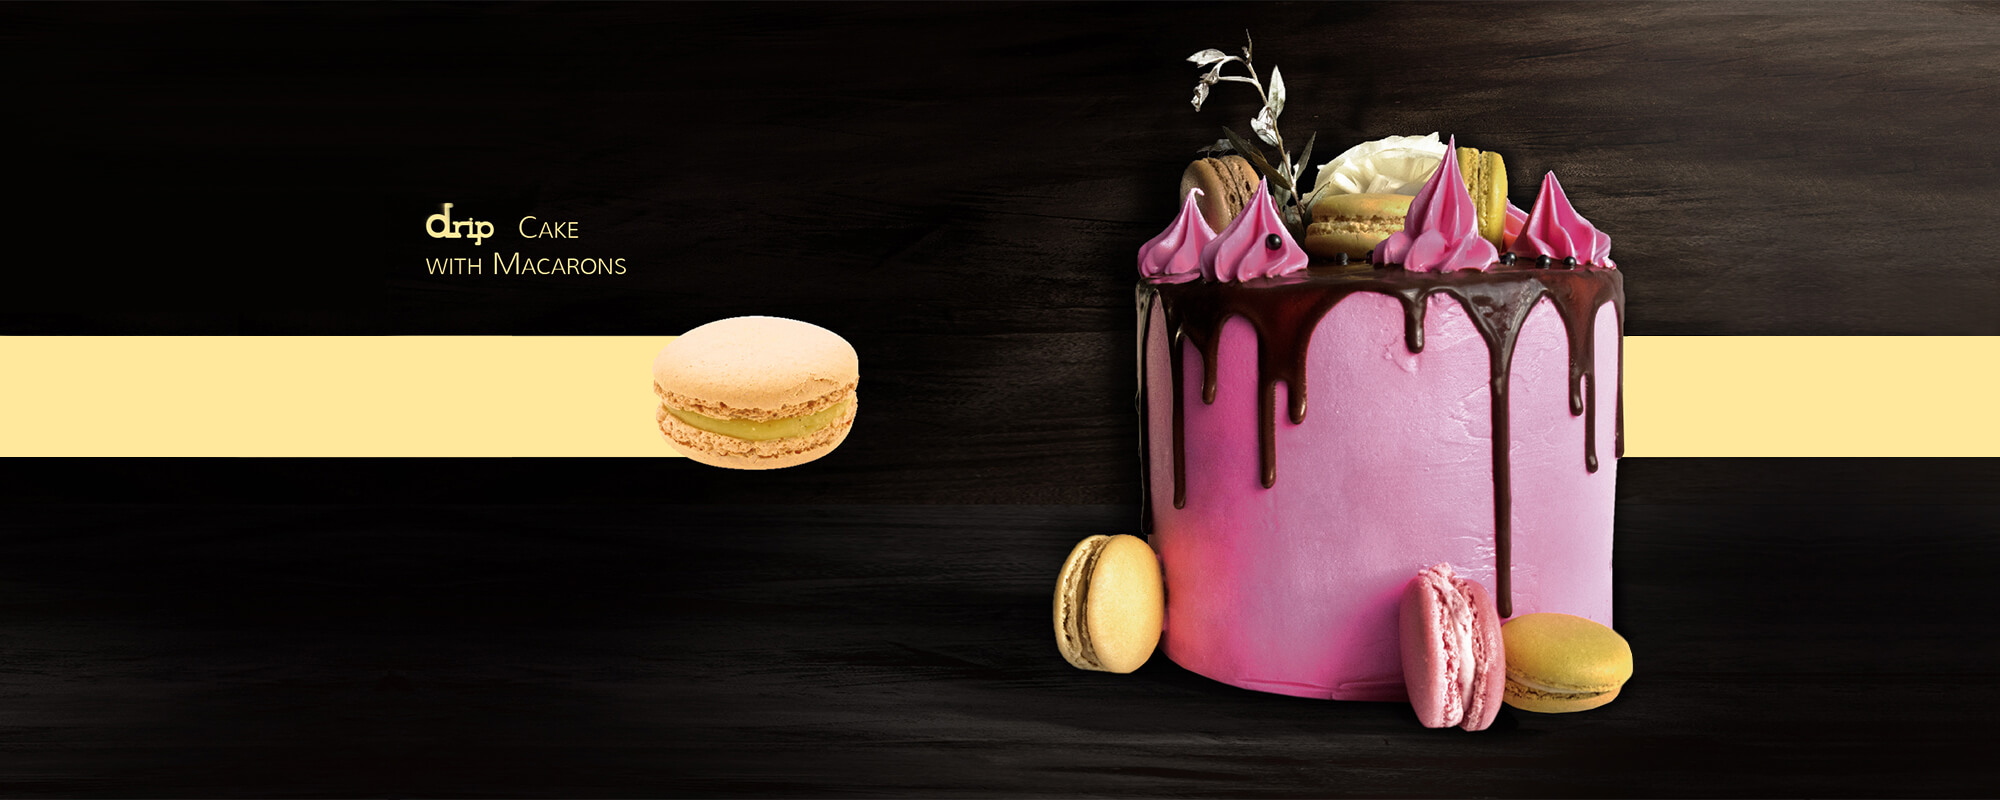 CAKE-DESIGN-DRIP-CAKE-WITH-MACARONS